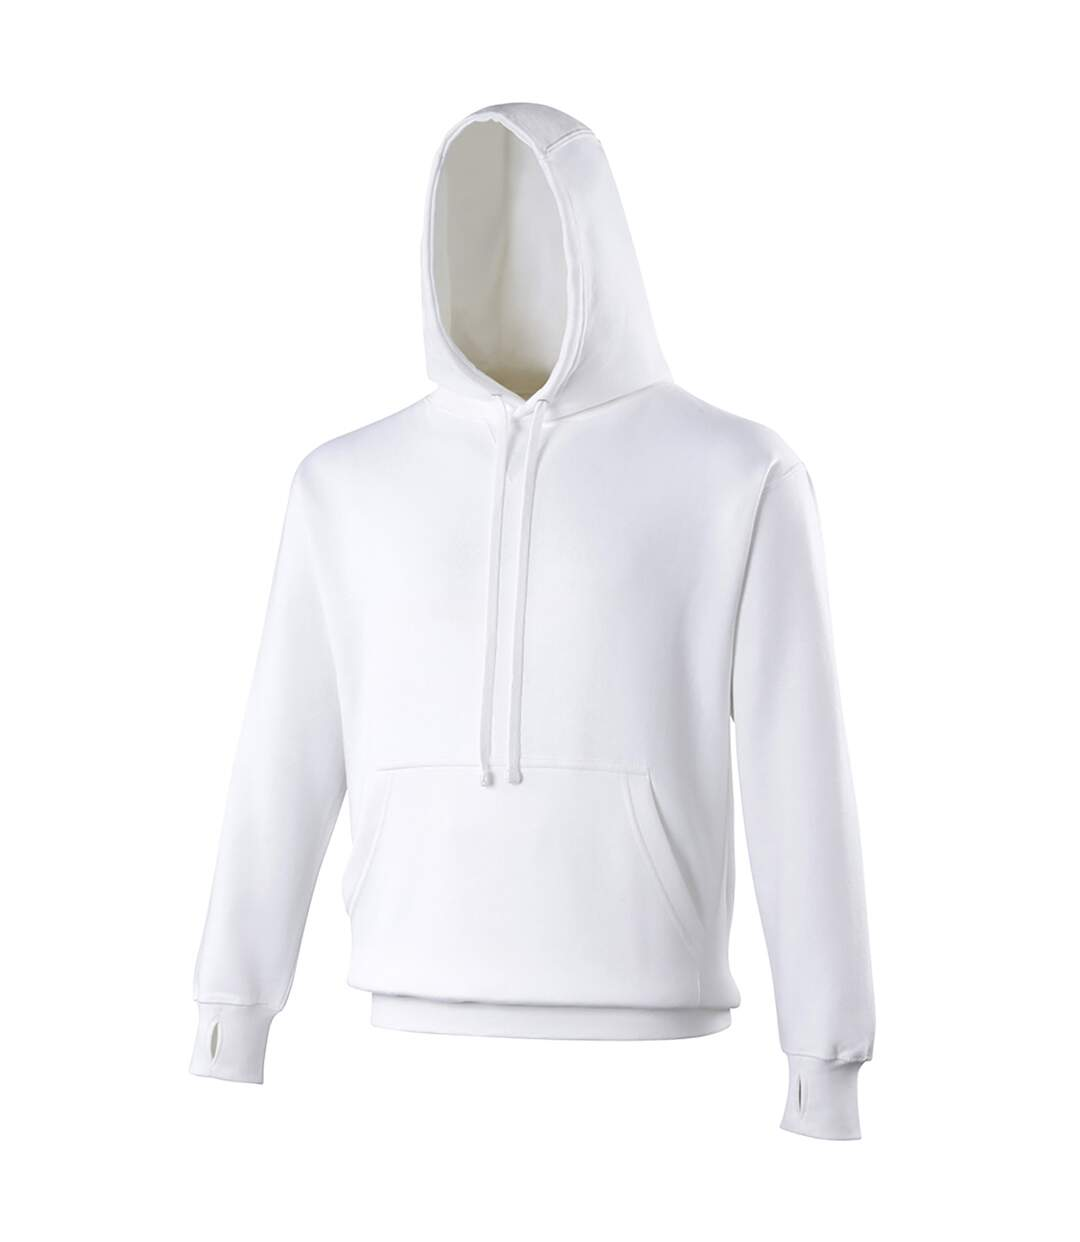 Awdis - Sweatshirt À Capuche - Homme (Chocolat) - UTRW170